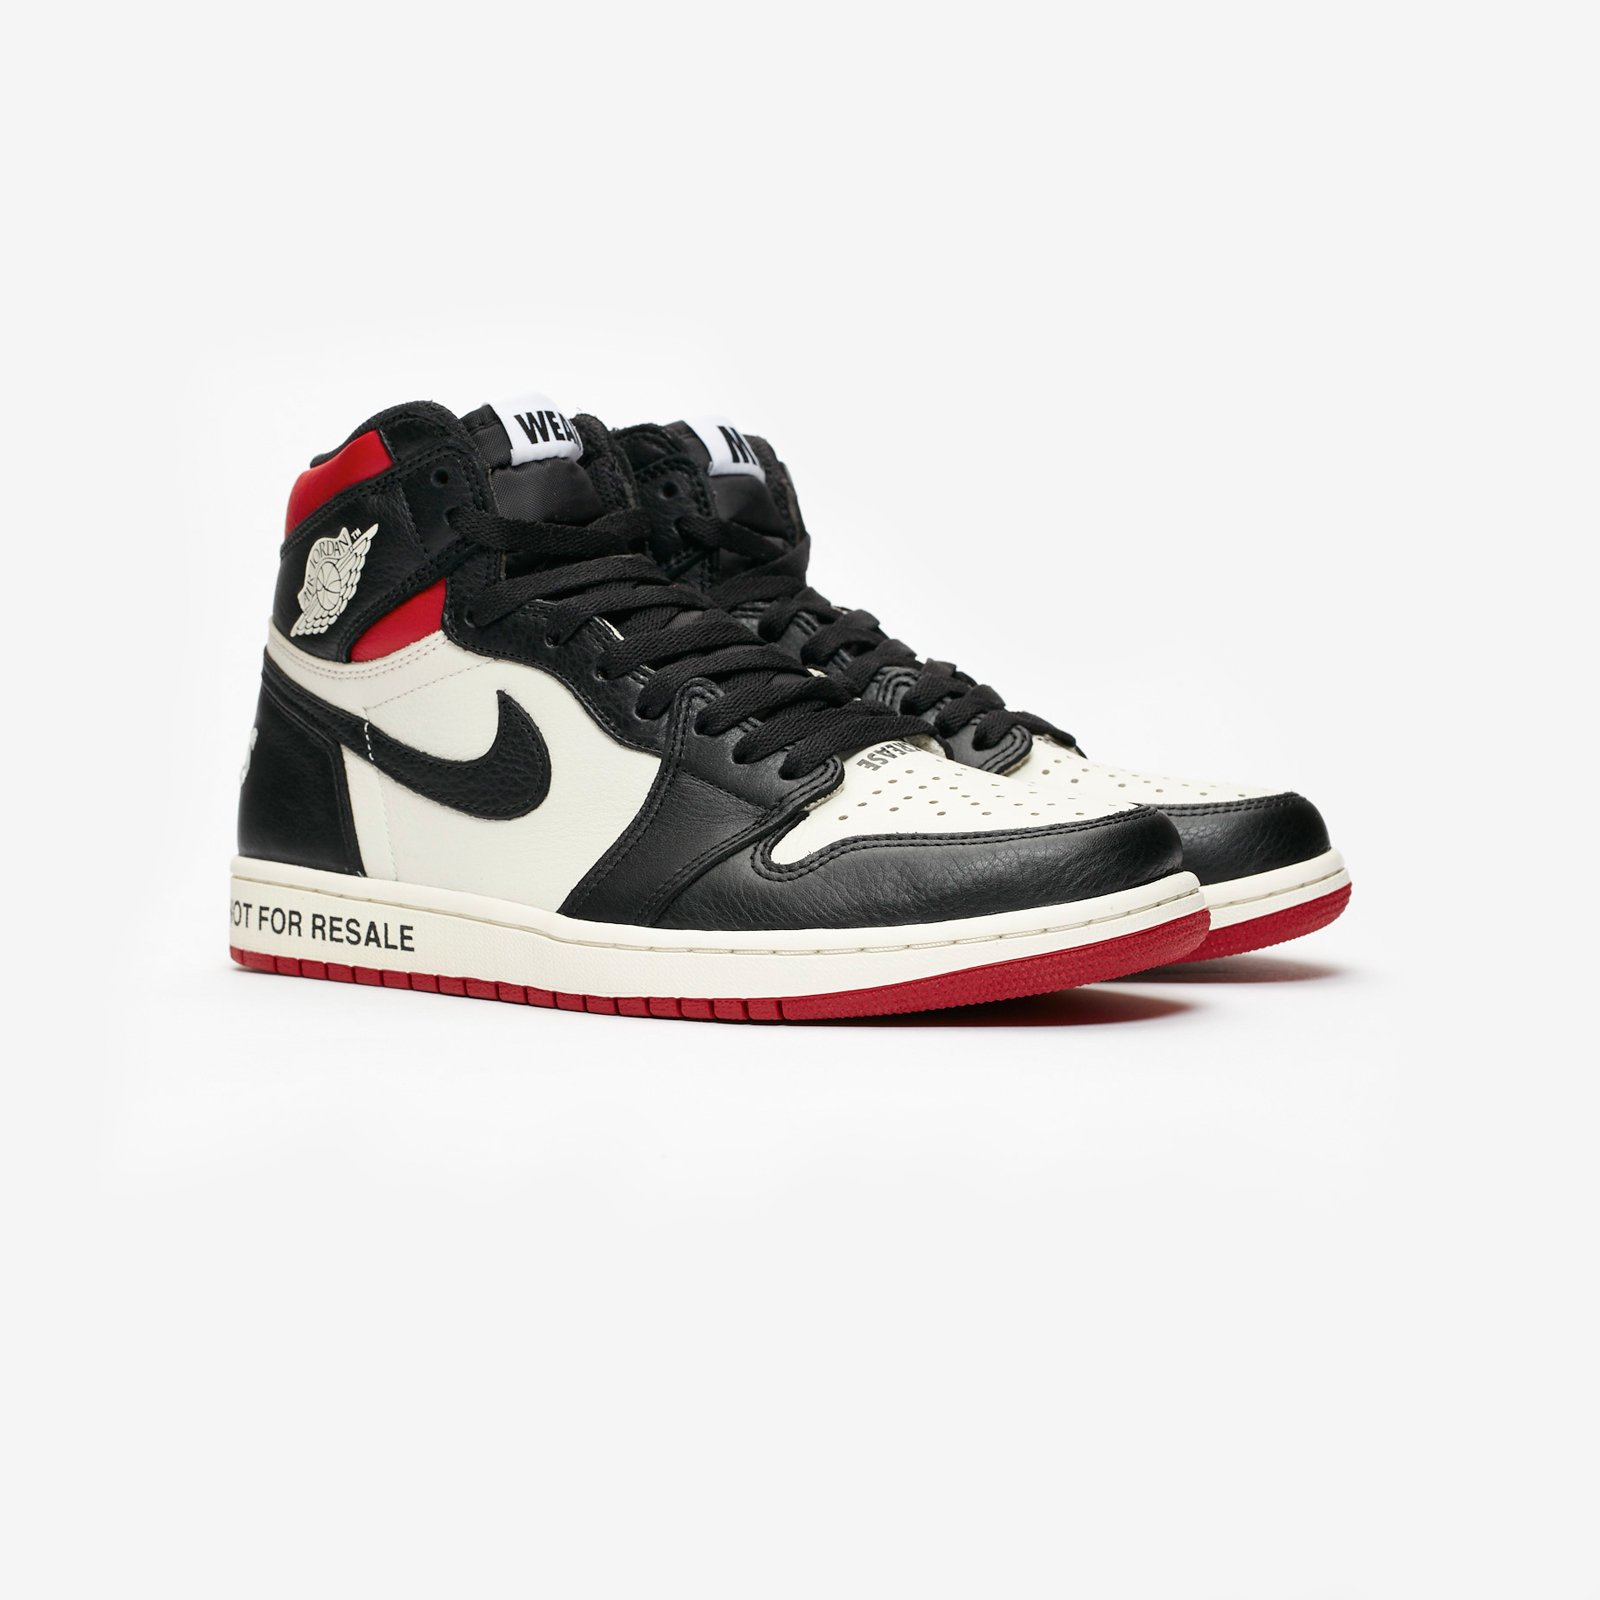 separation shoes bf0fd acd51 Jordan Brand Air Jordan 1 Retro High NRG - 861428-106 ...